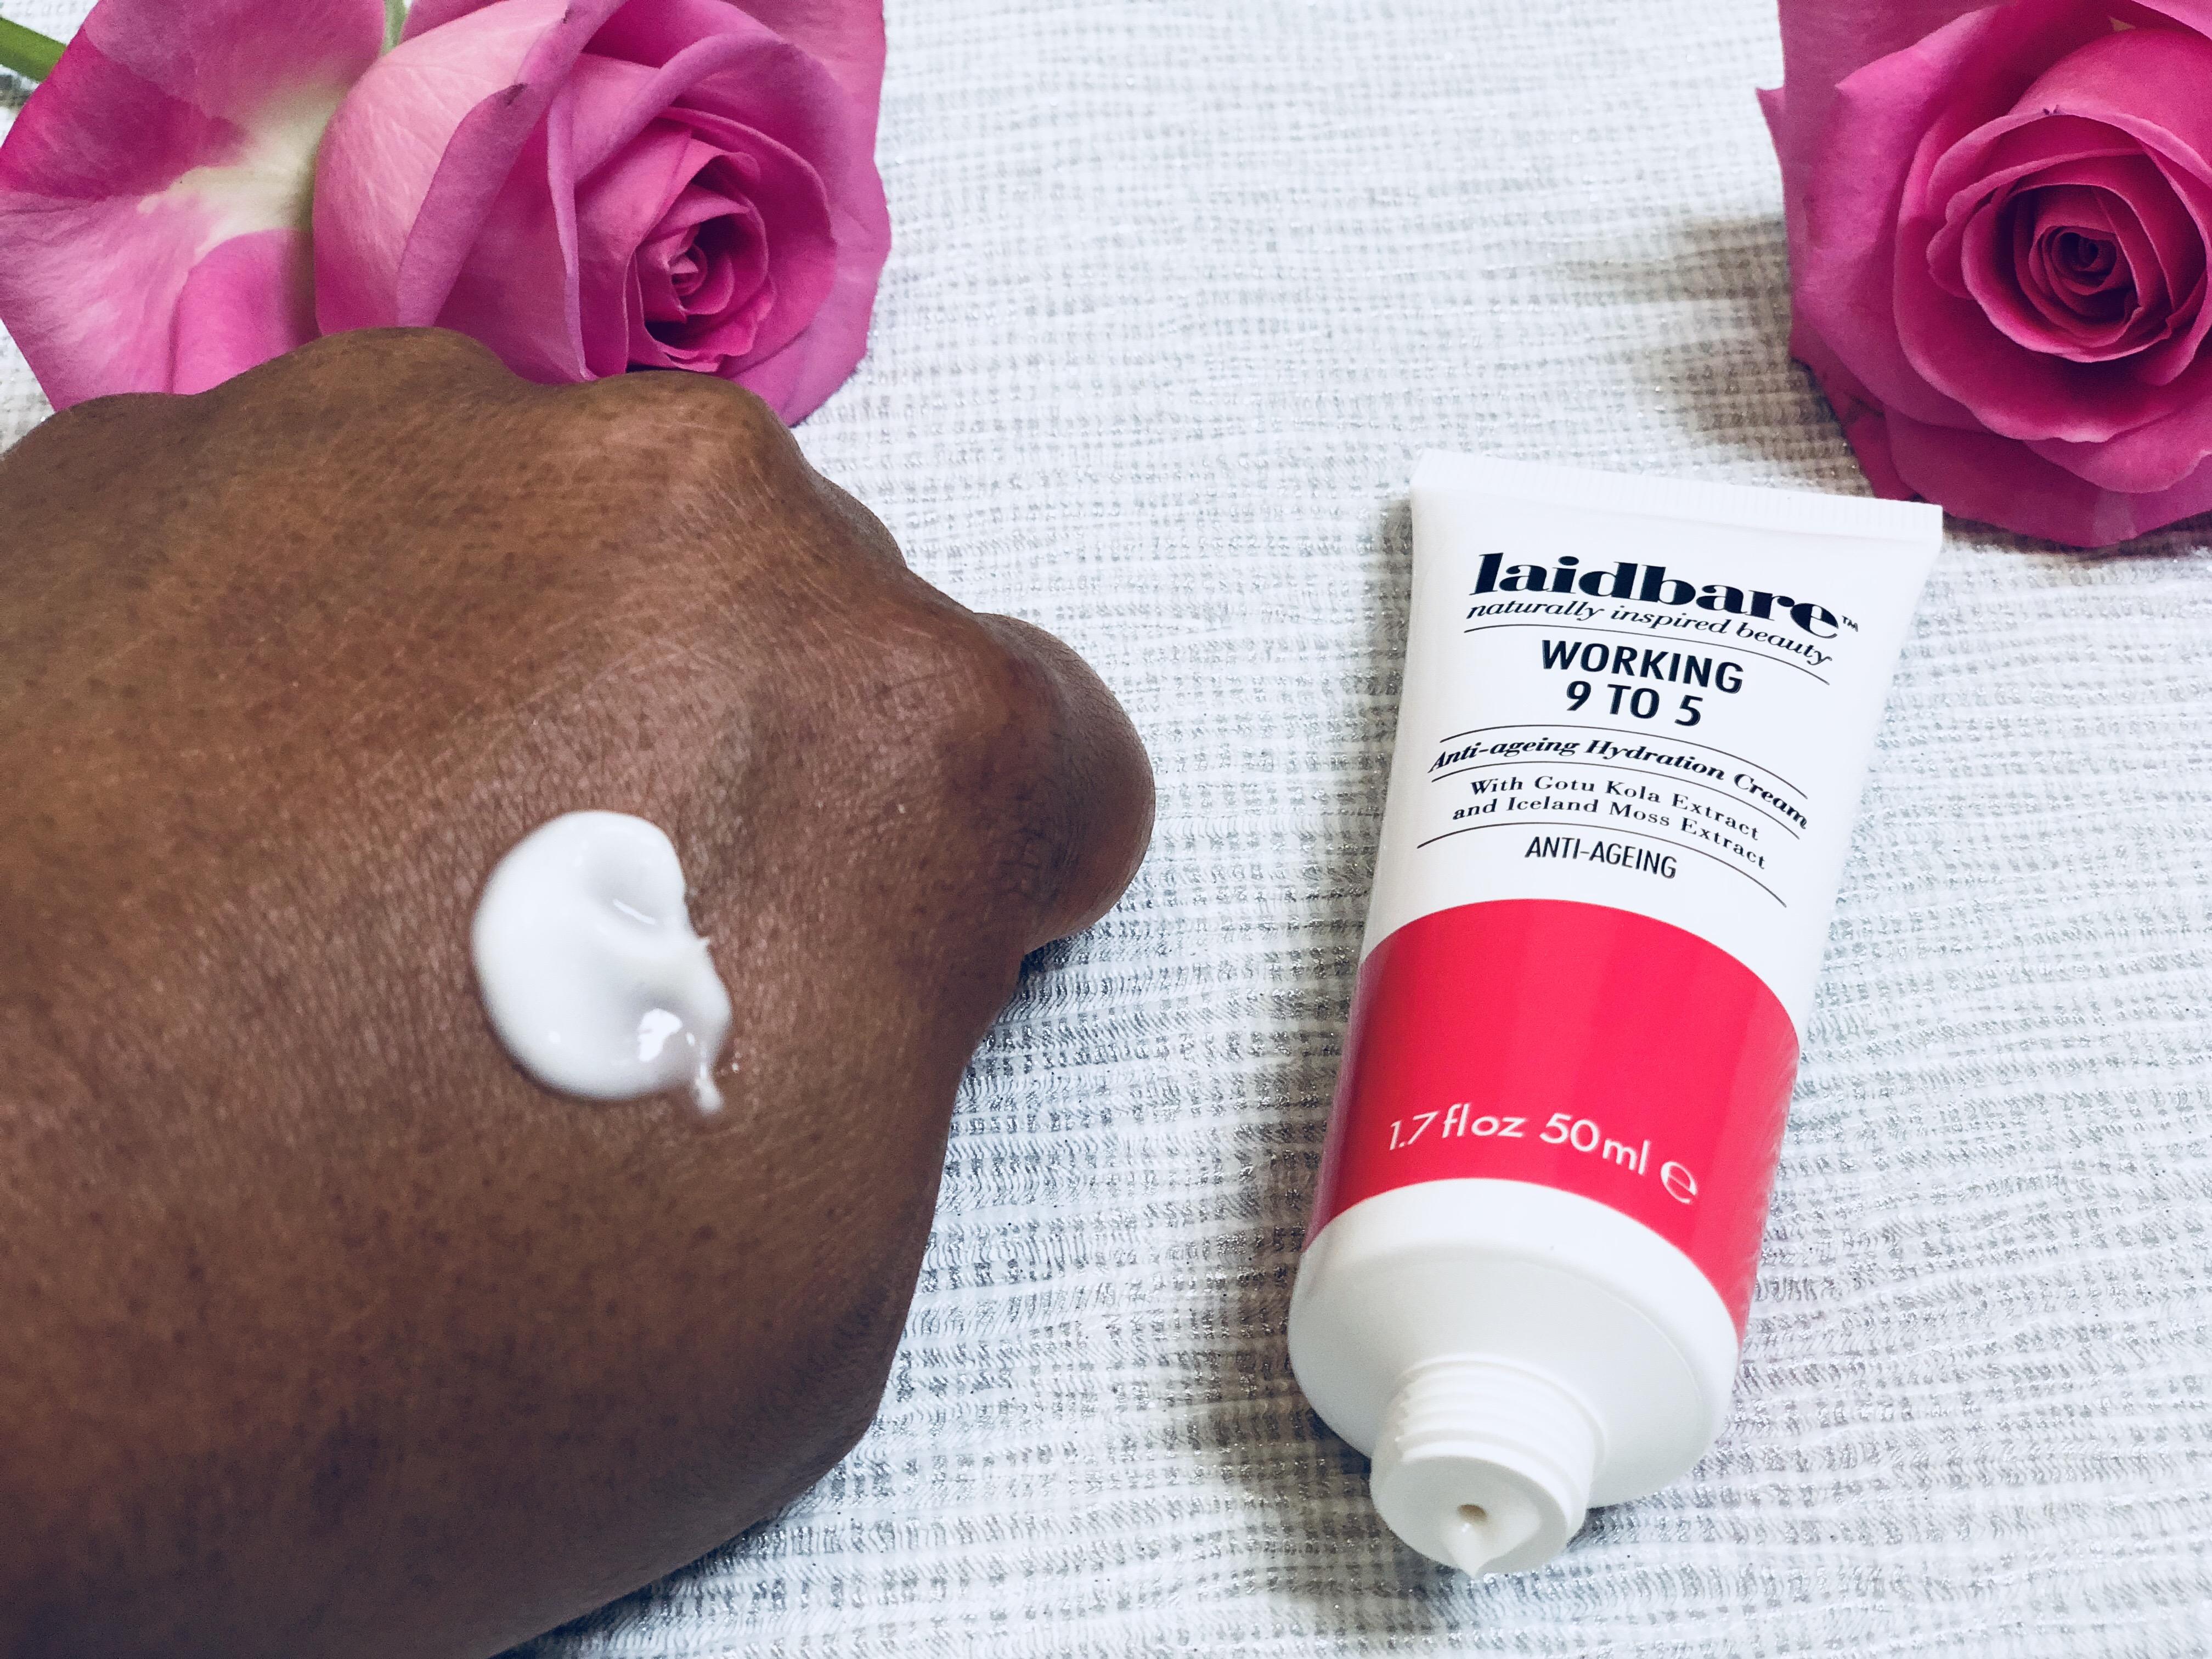 Laidbare Working 9 to 5 Anti-ageing Cream 50ml